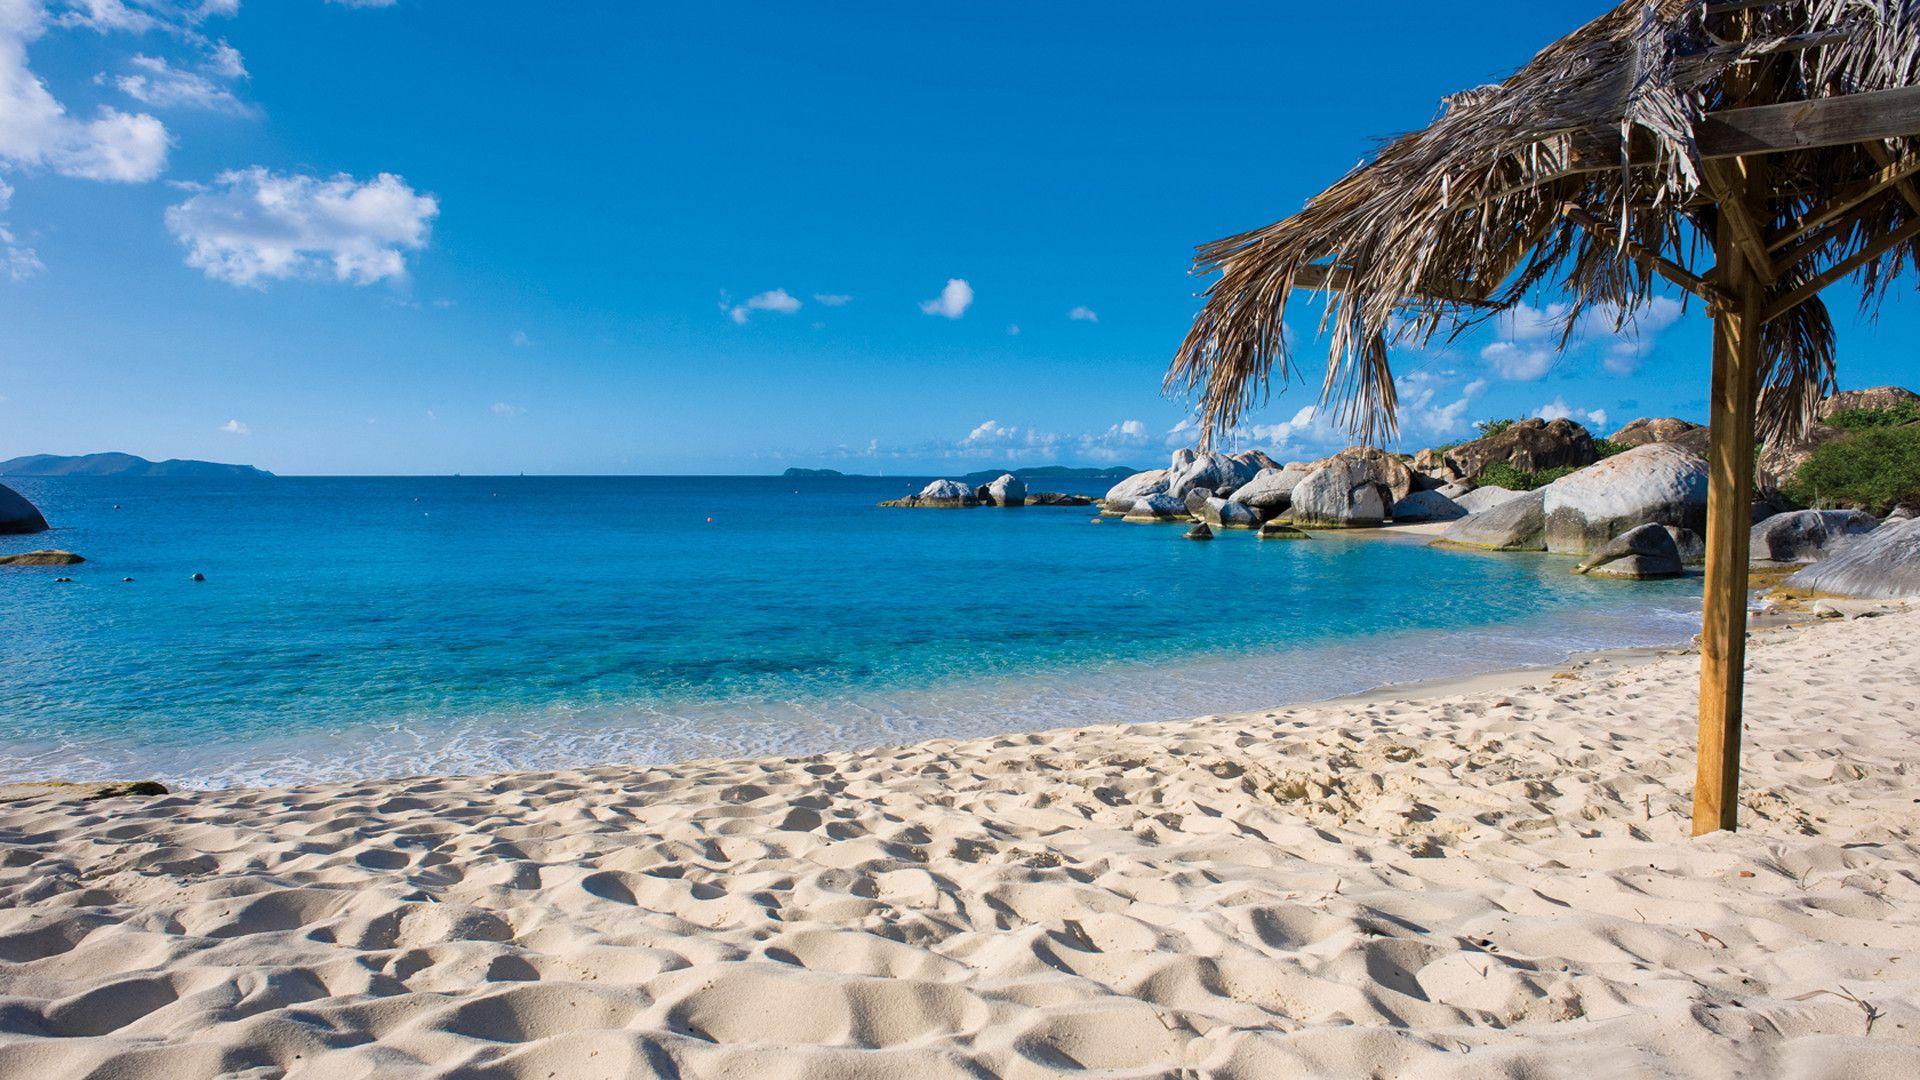 Mexican Beach Desktop Wallpapers Top Free Mexican Beach